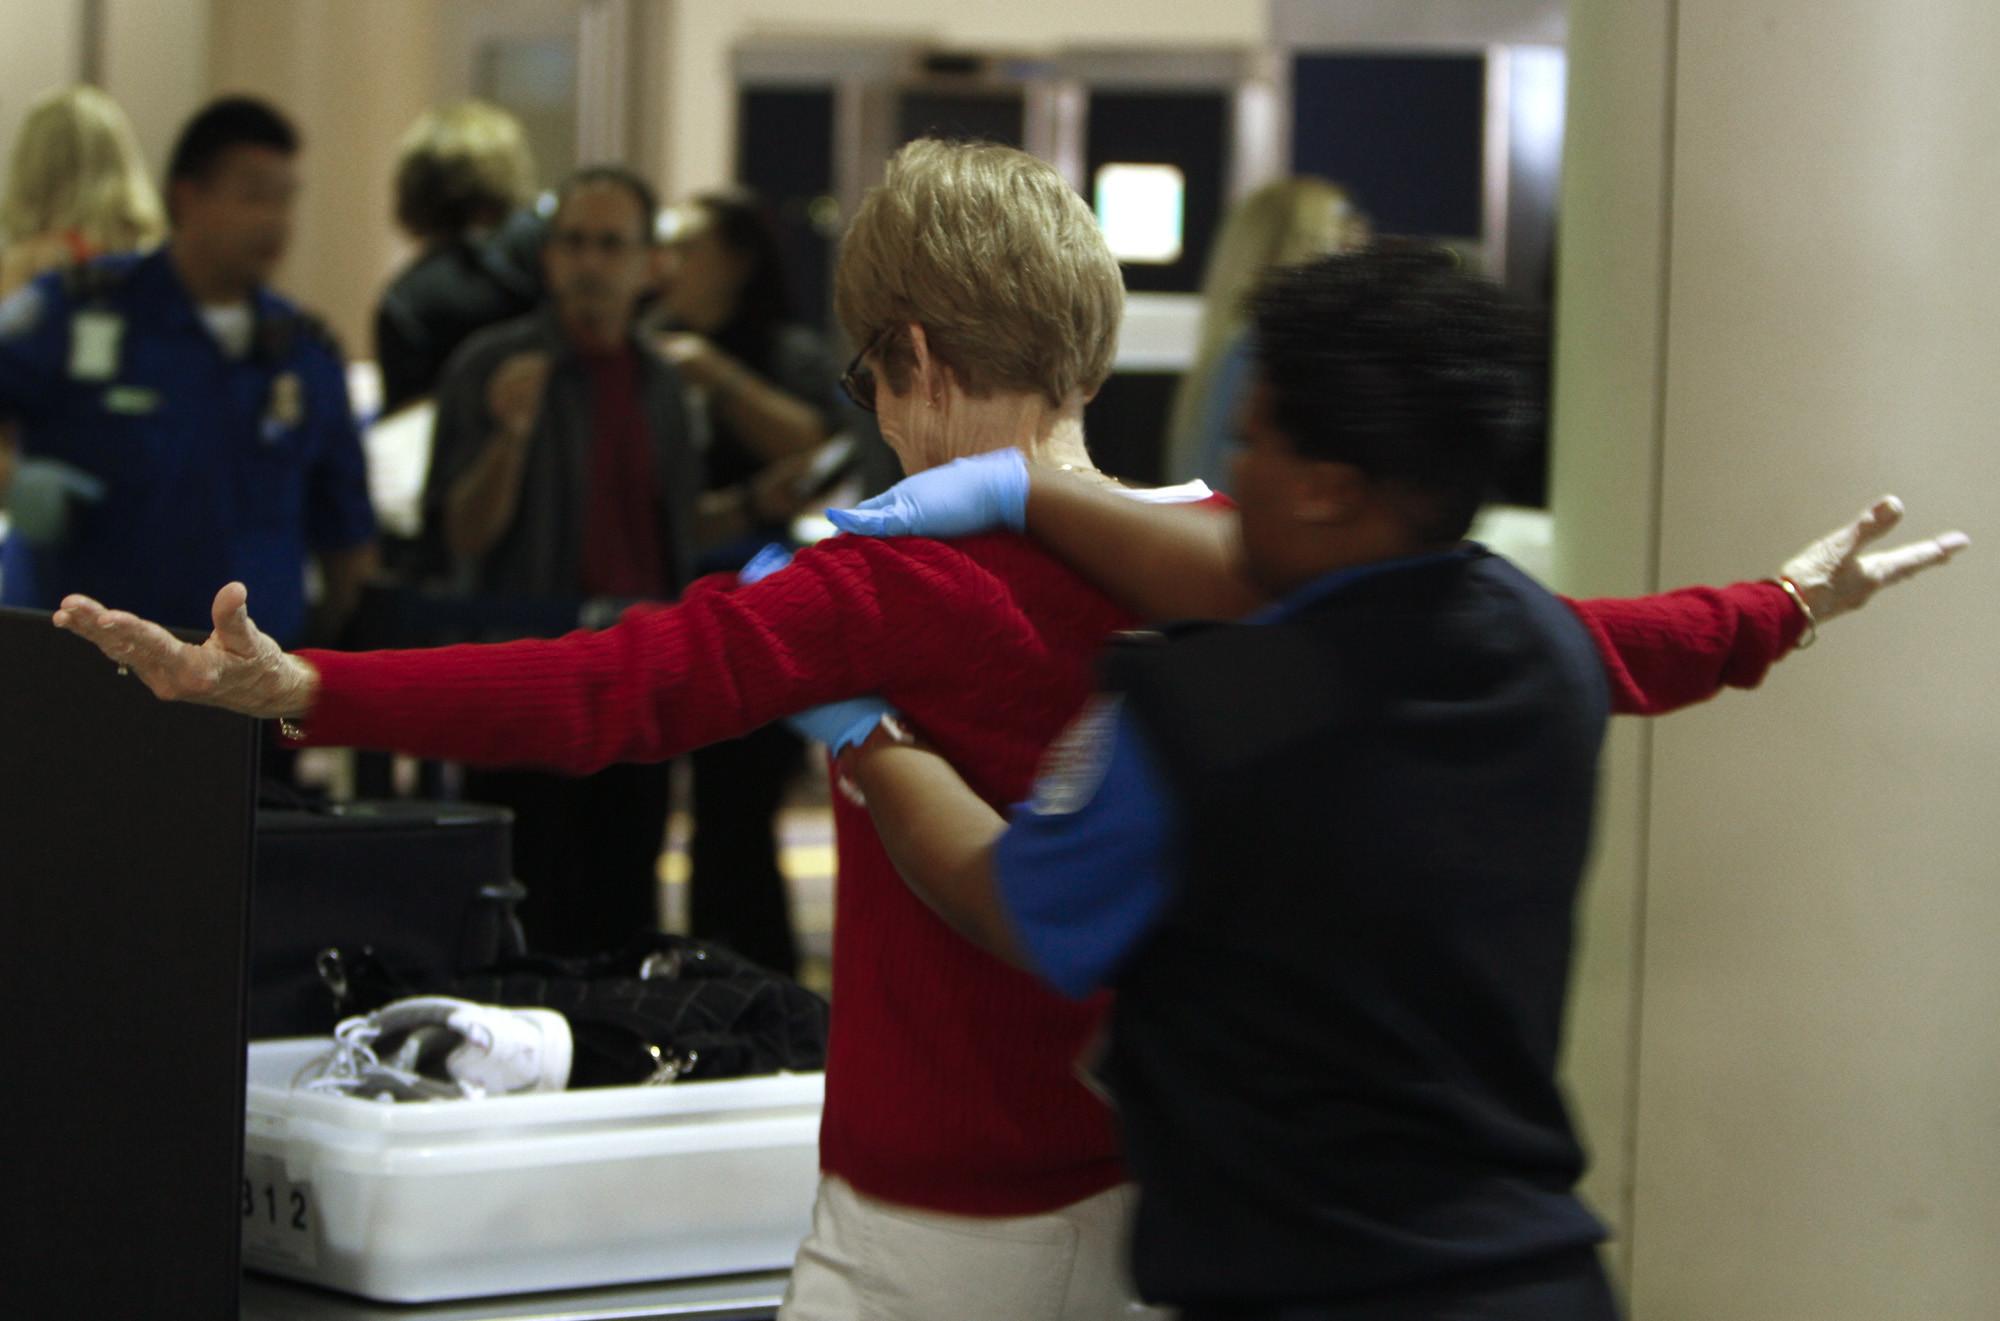 Tsa Quietly Launches New Enhanced Pat Down Procedure For Air Travelers